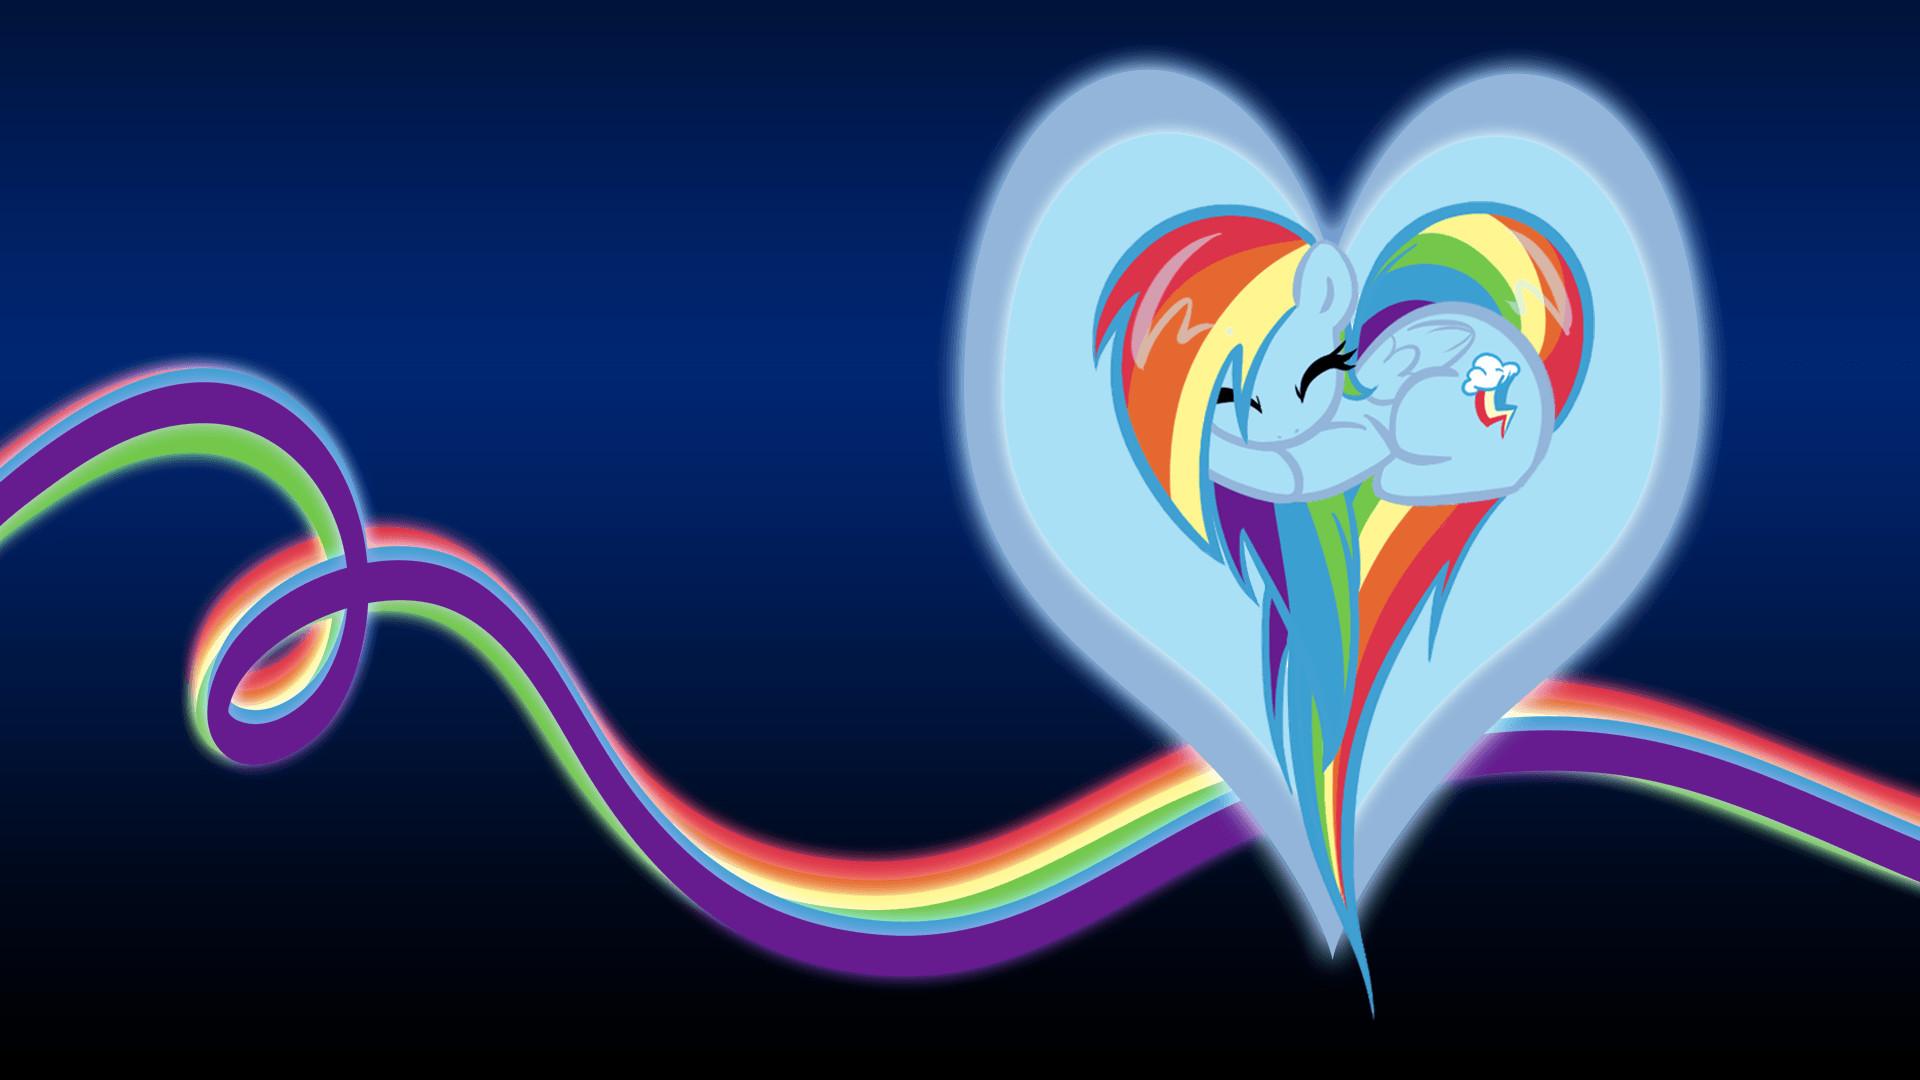 my little pony wallpaper 1920x1080